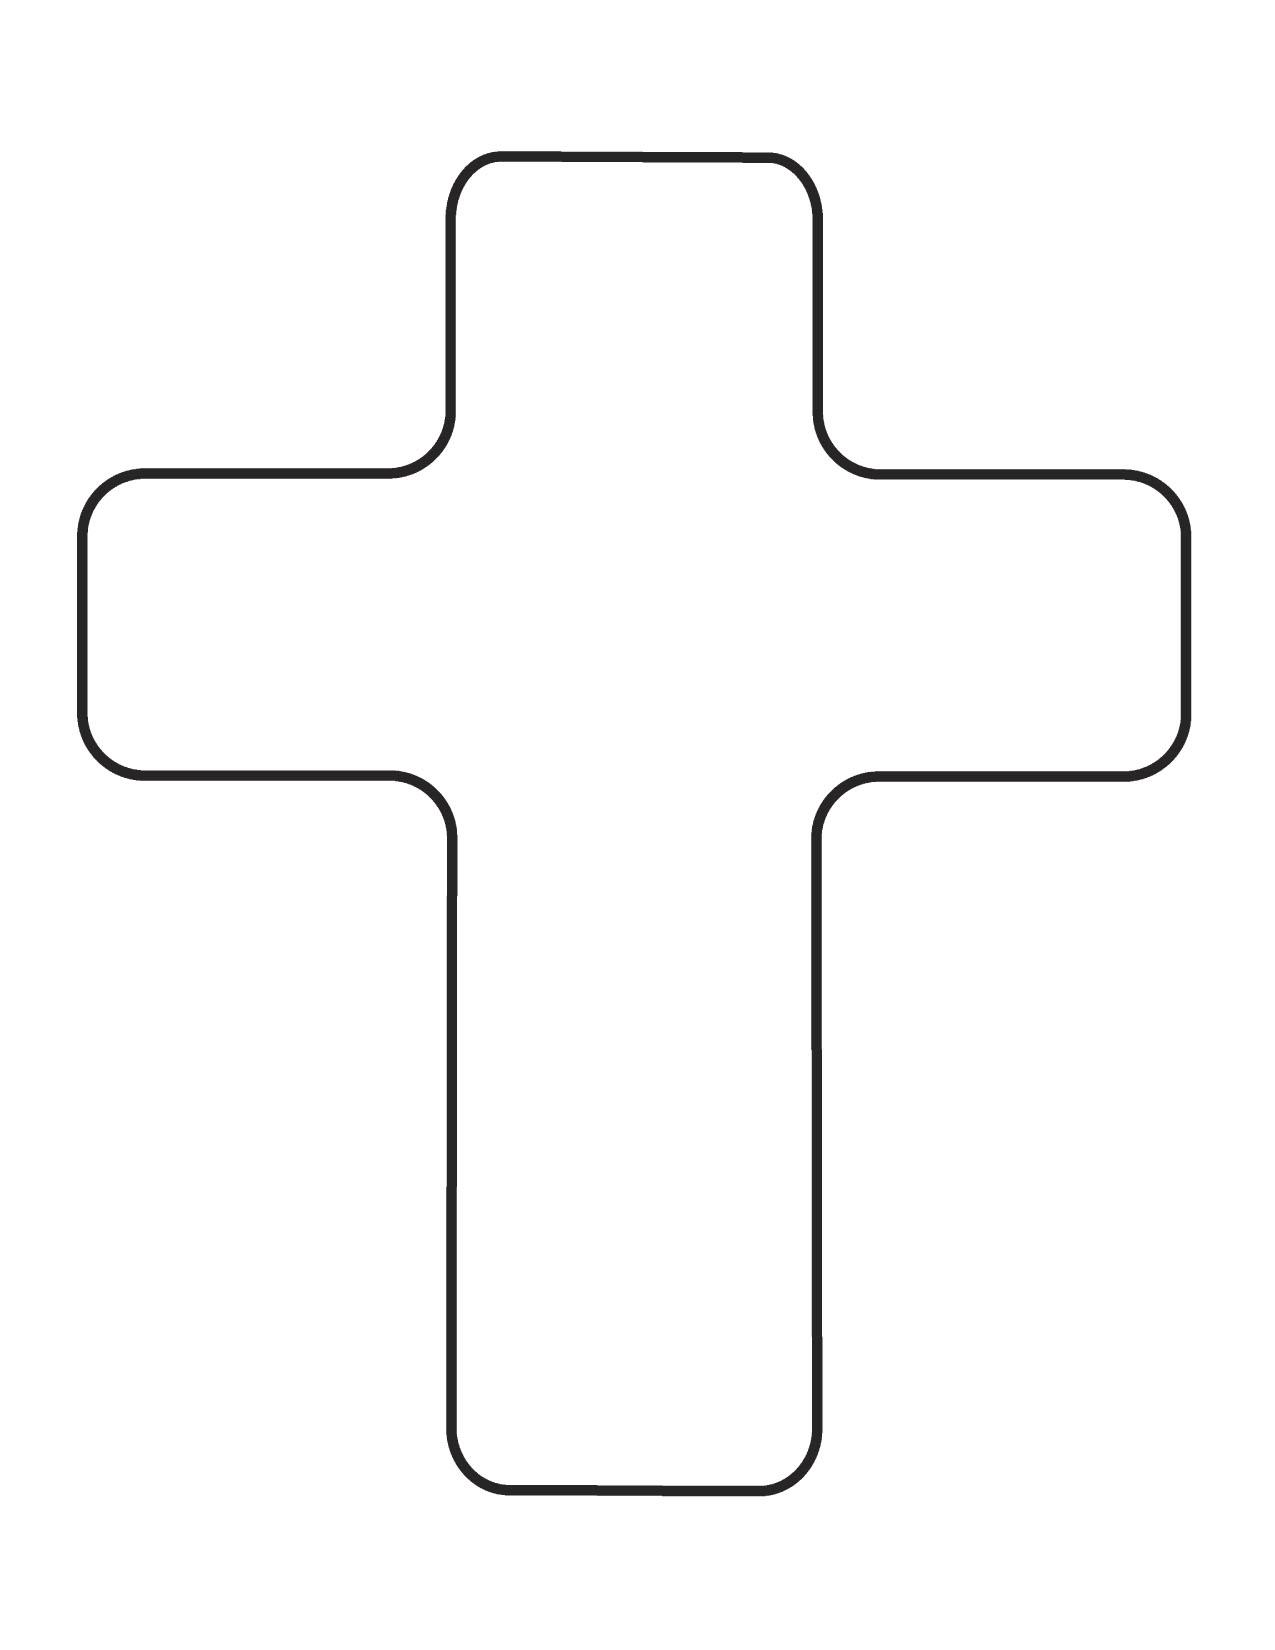 Plain Cross Clipart - Clipart Kid